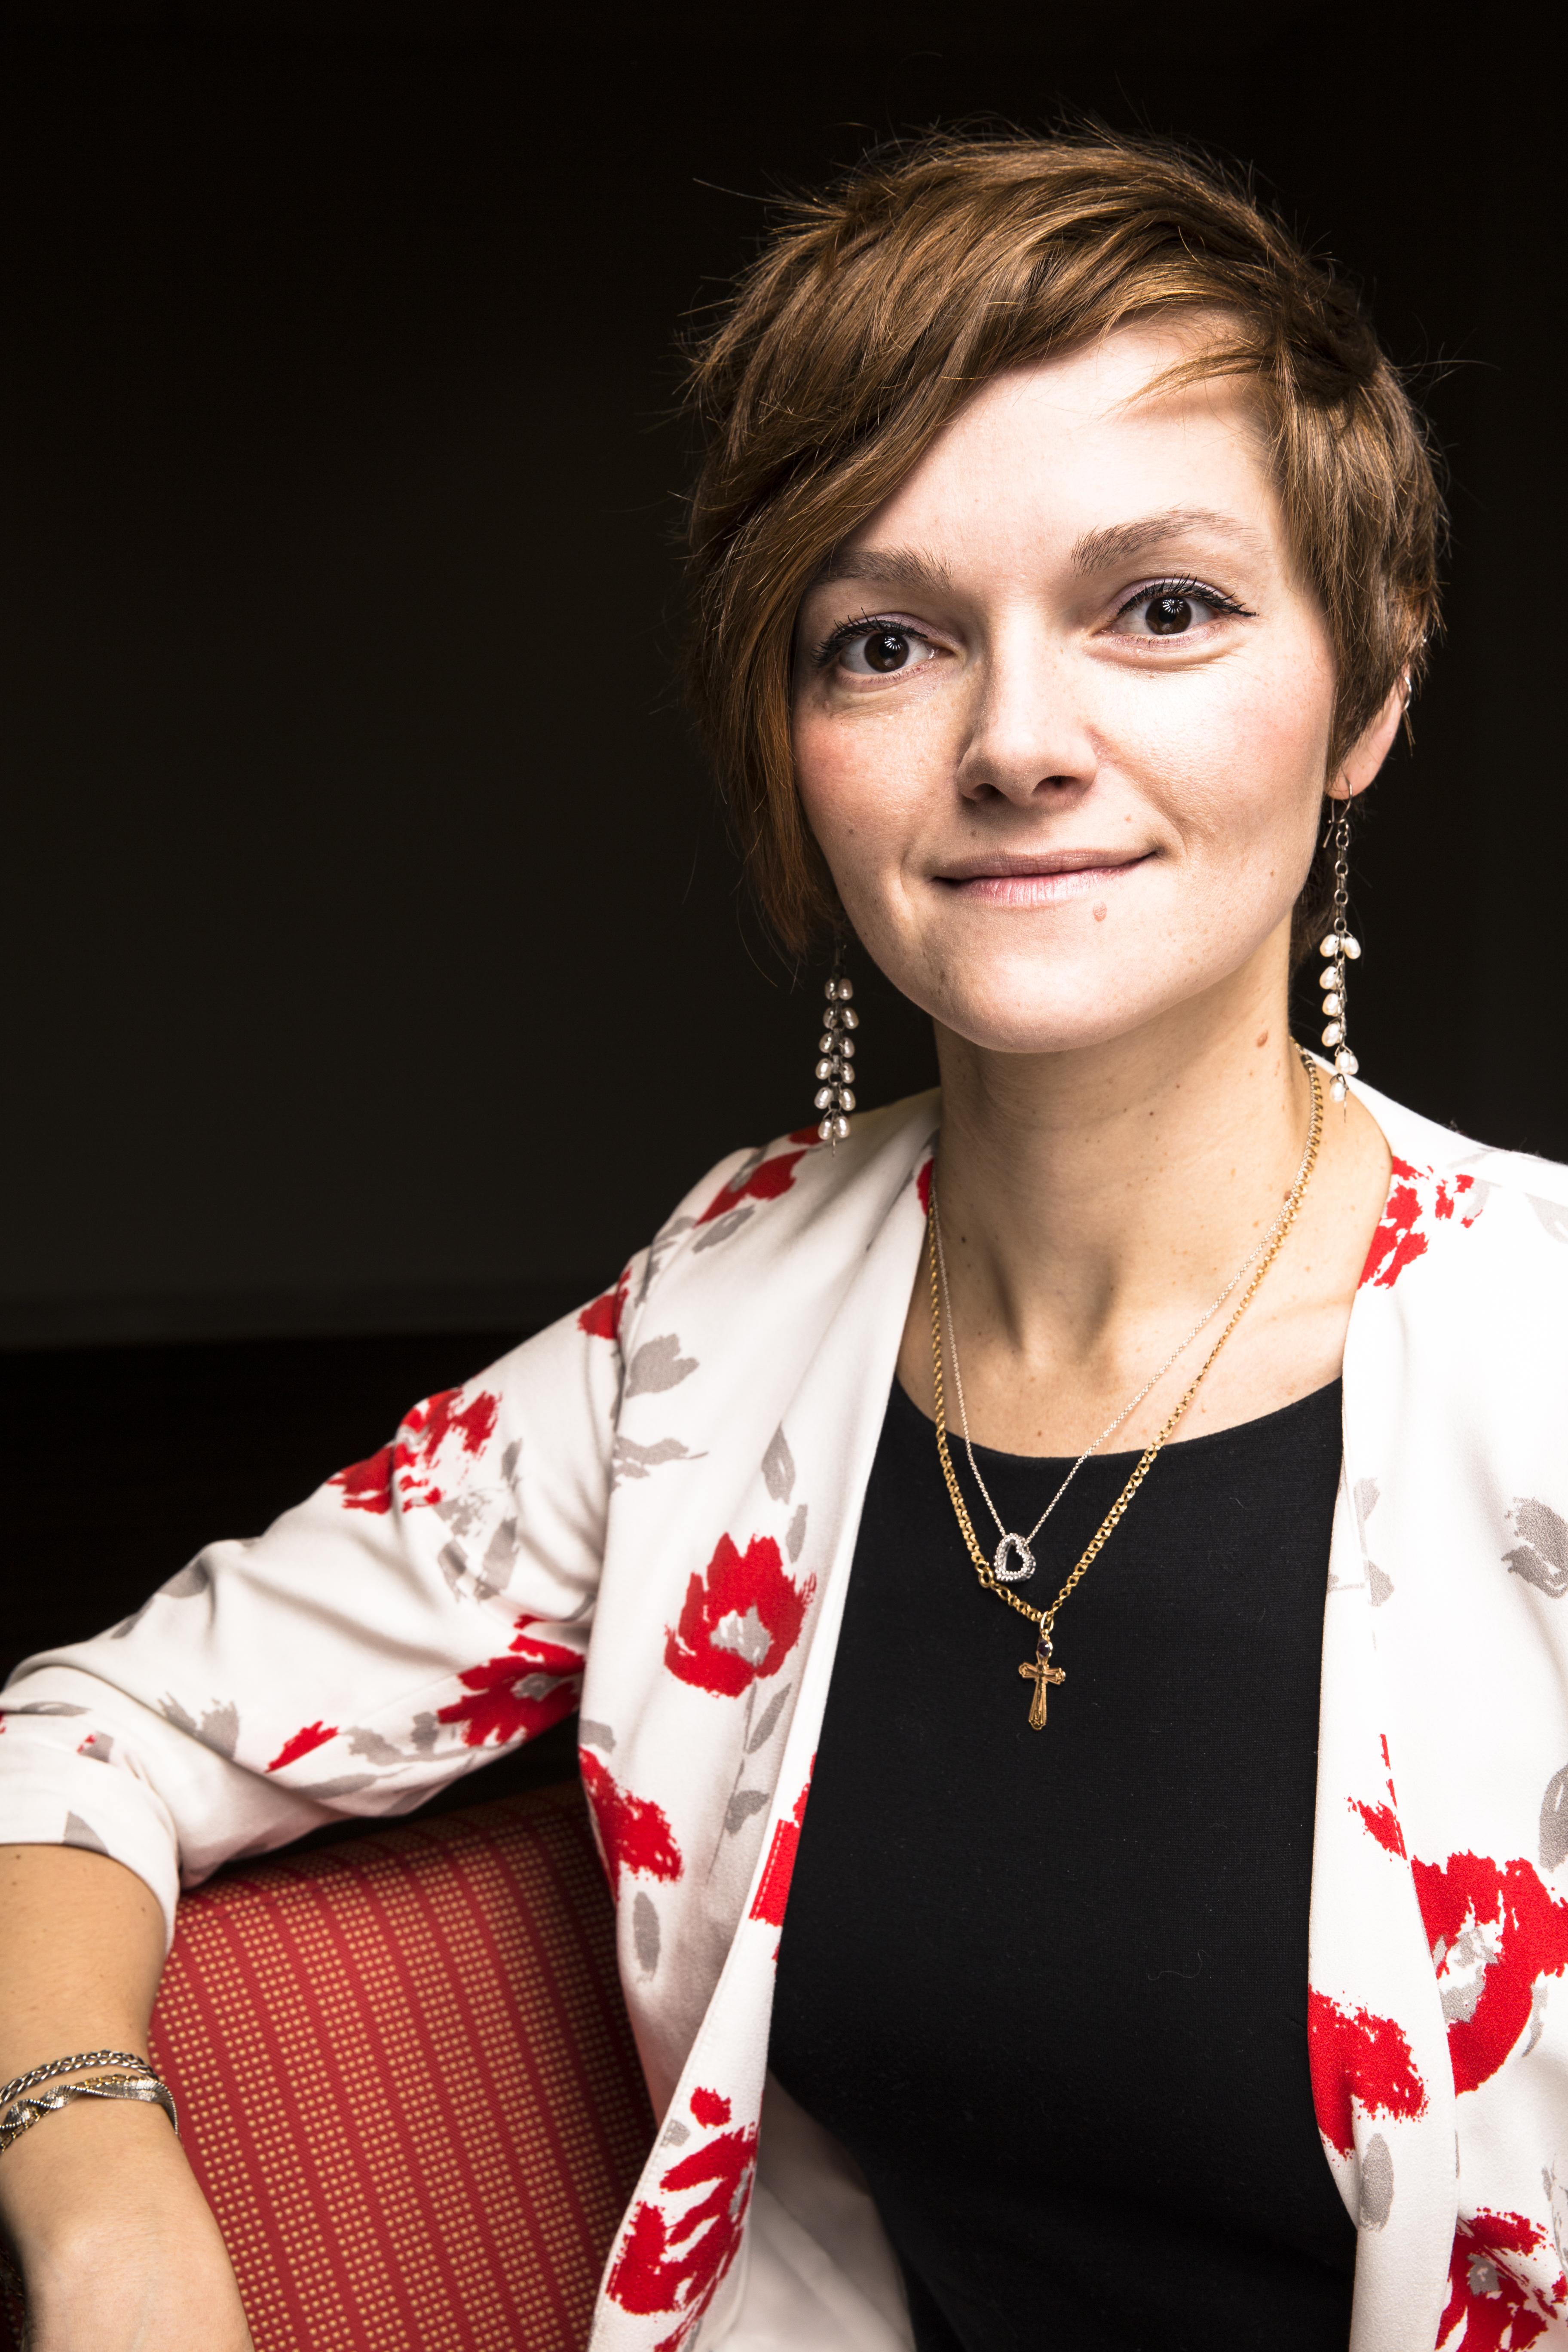 Dr. Ekaterina Dobryakova